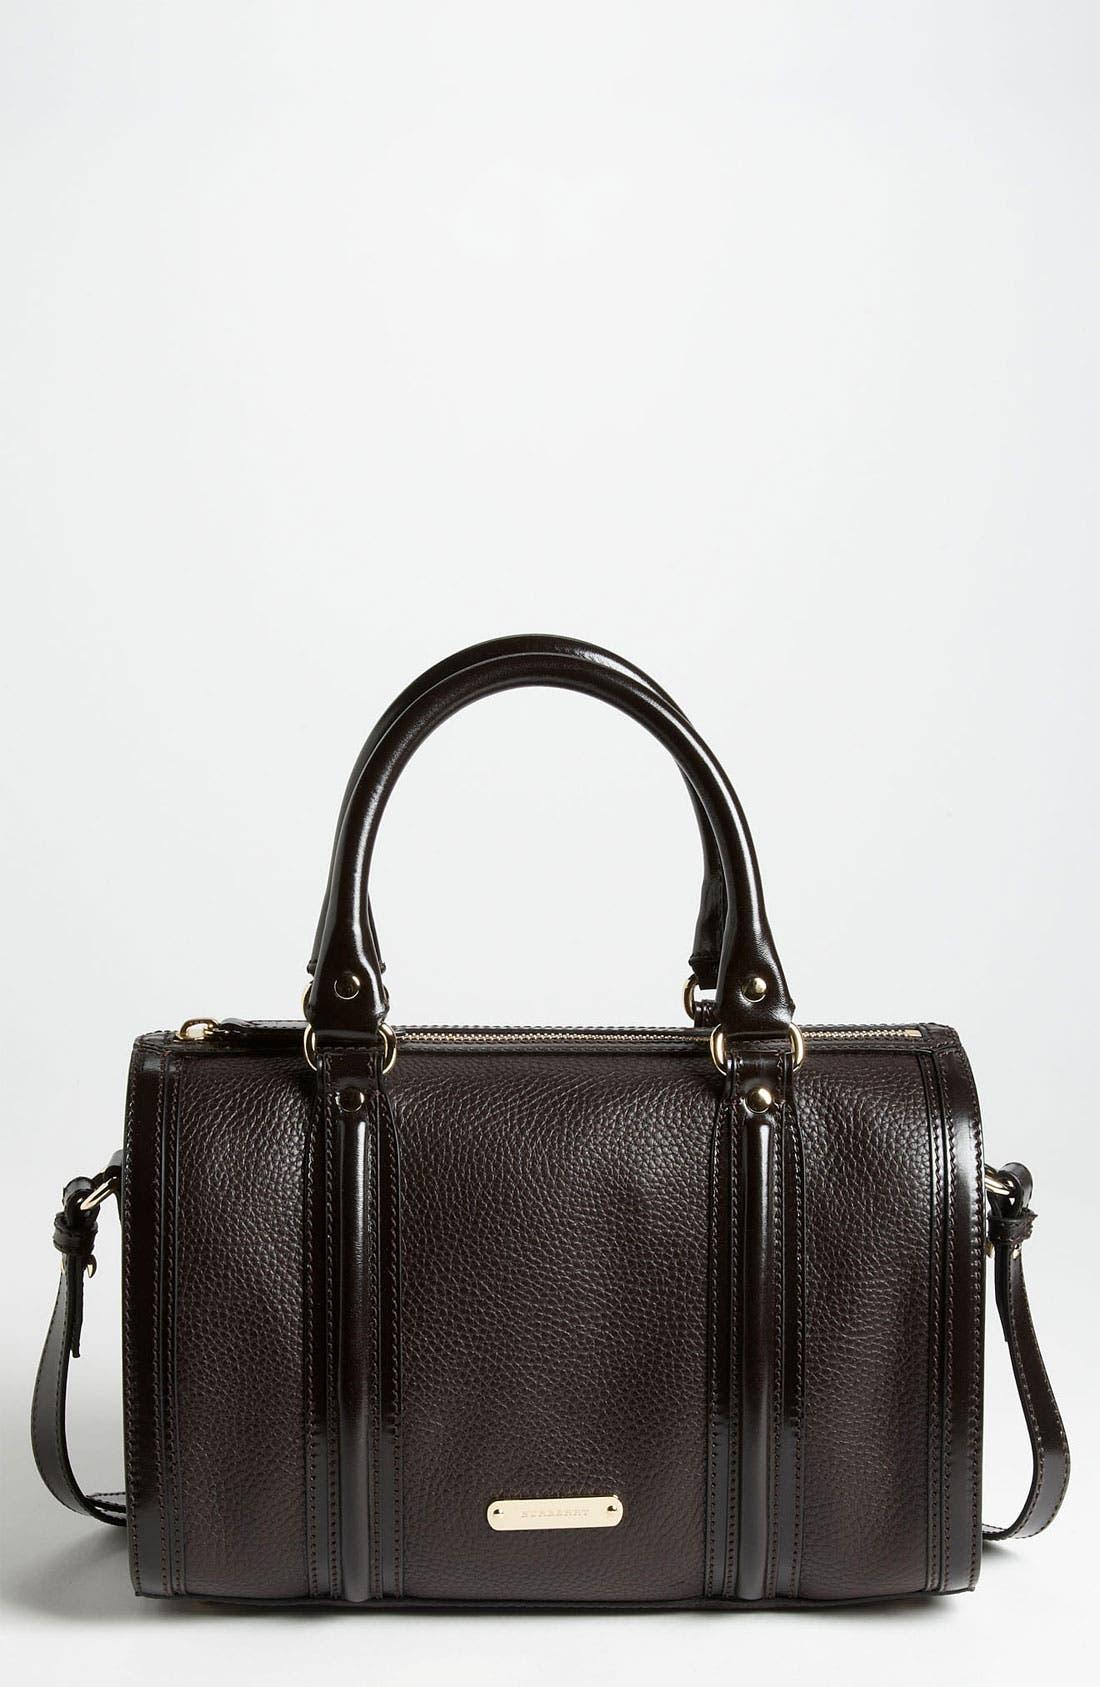 Alternate Image 1 Selected - Burberry 'London Grainy' Leather Satchel, Medium